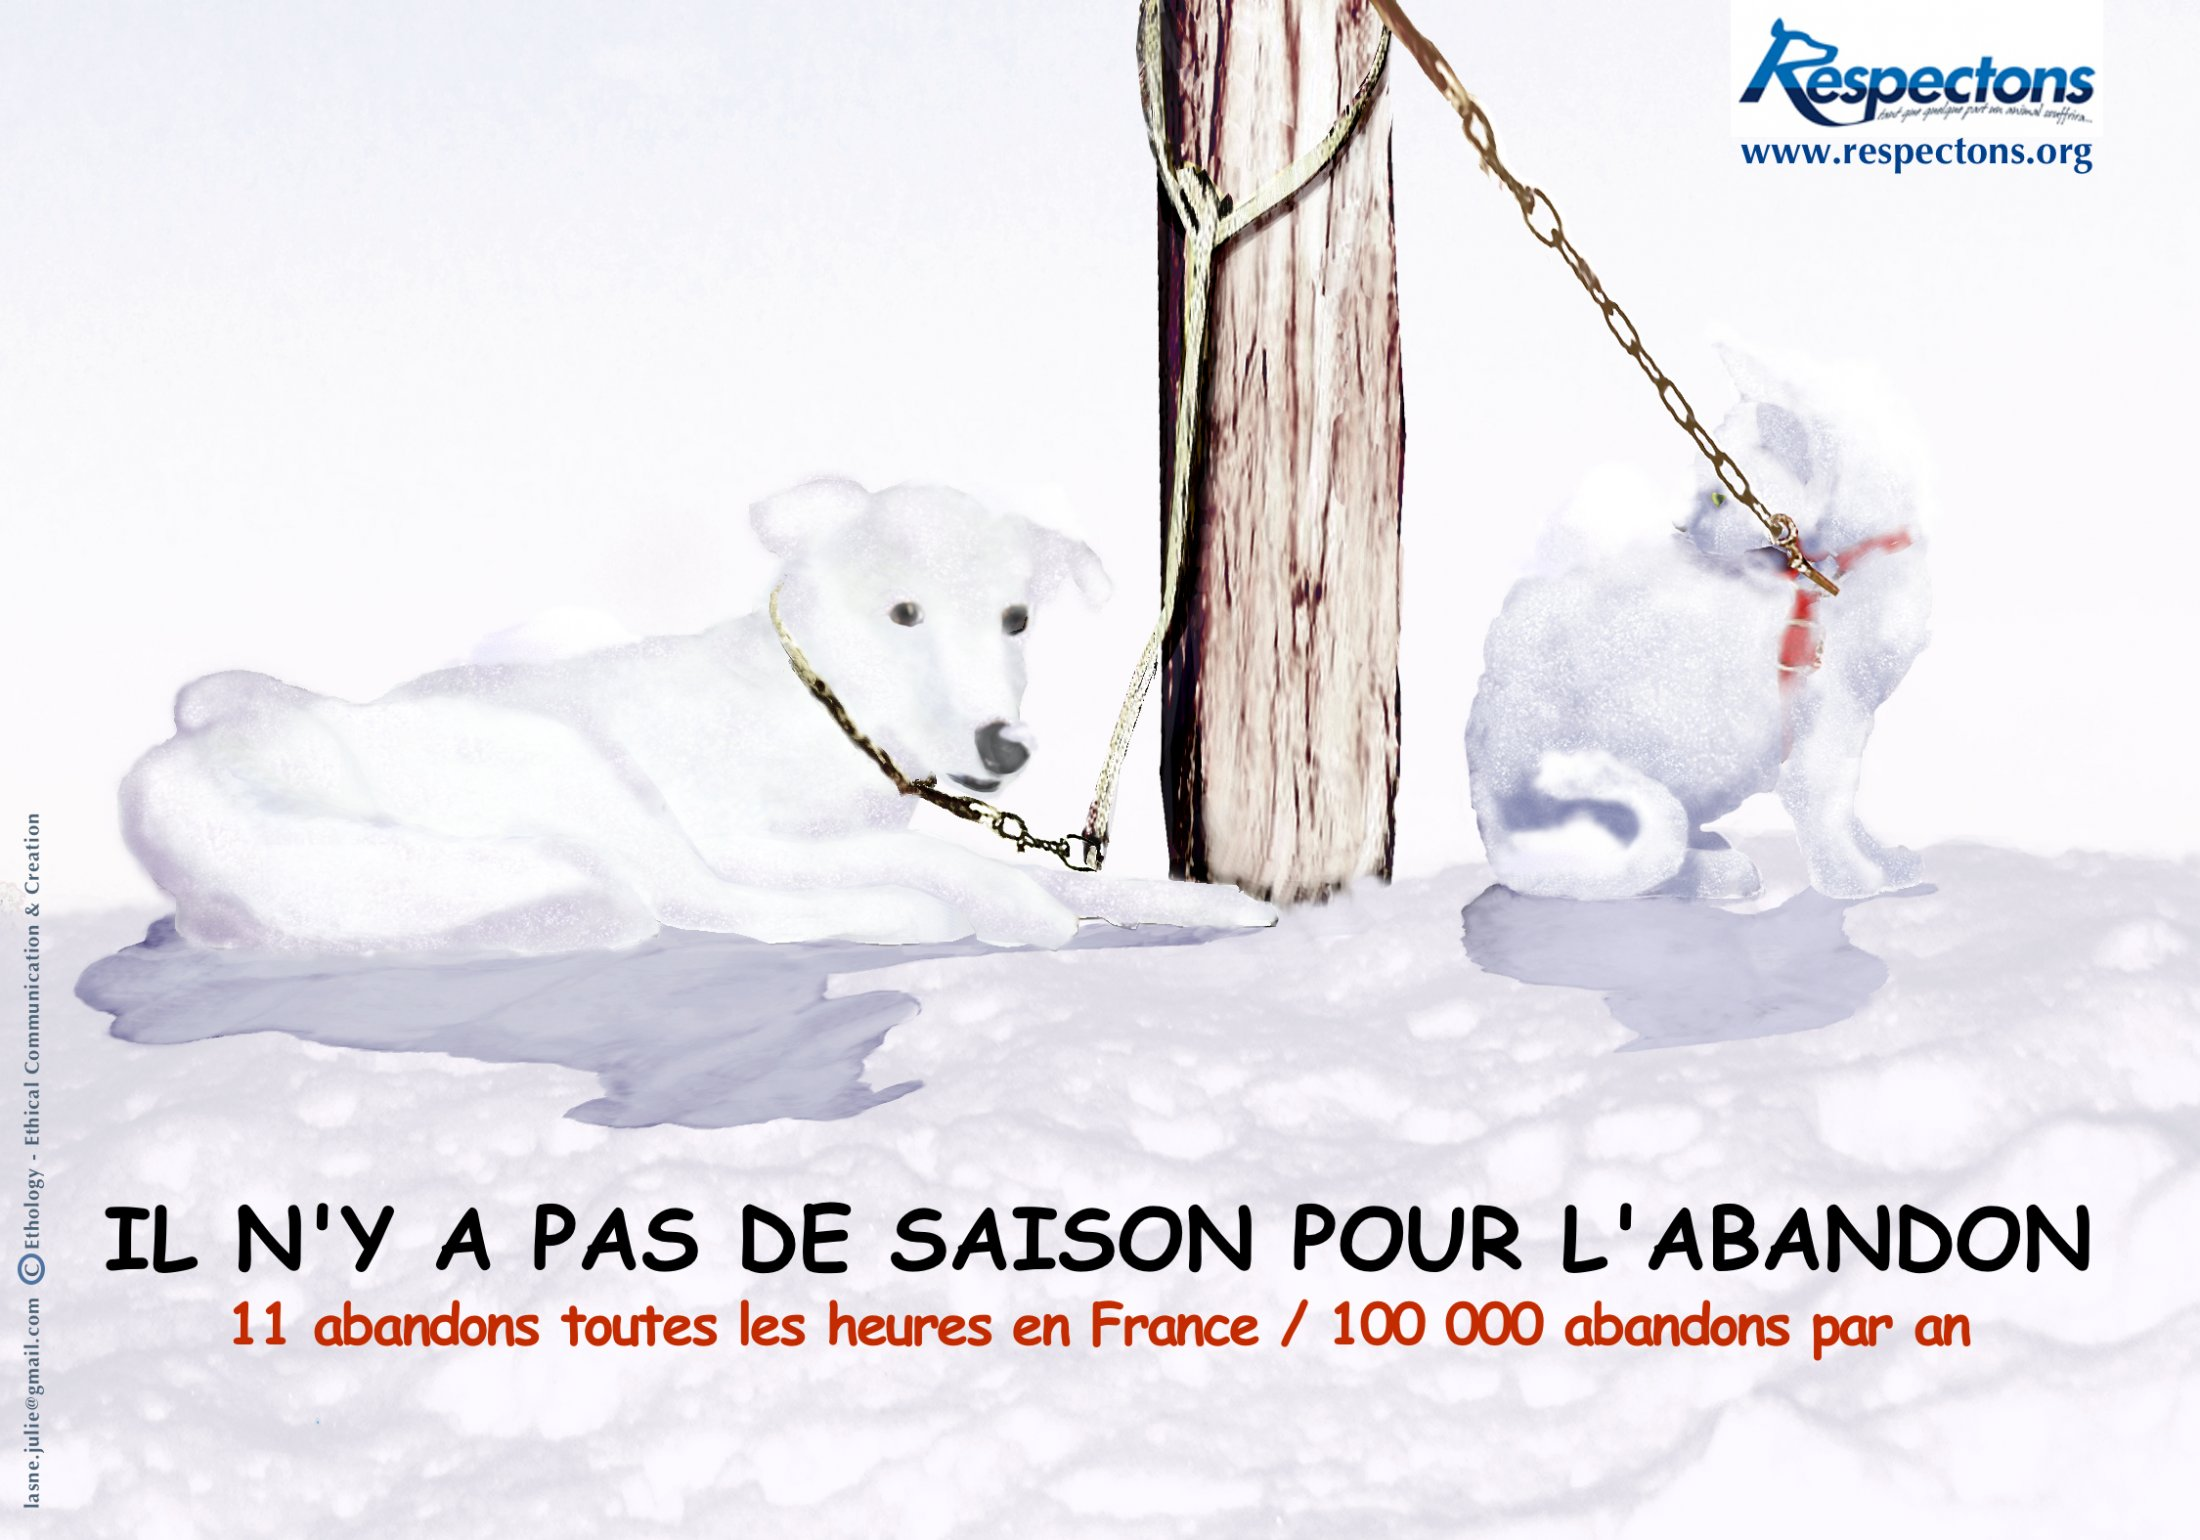 Affiche Abandon - RSPCA / Respectons